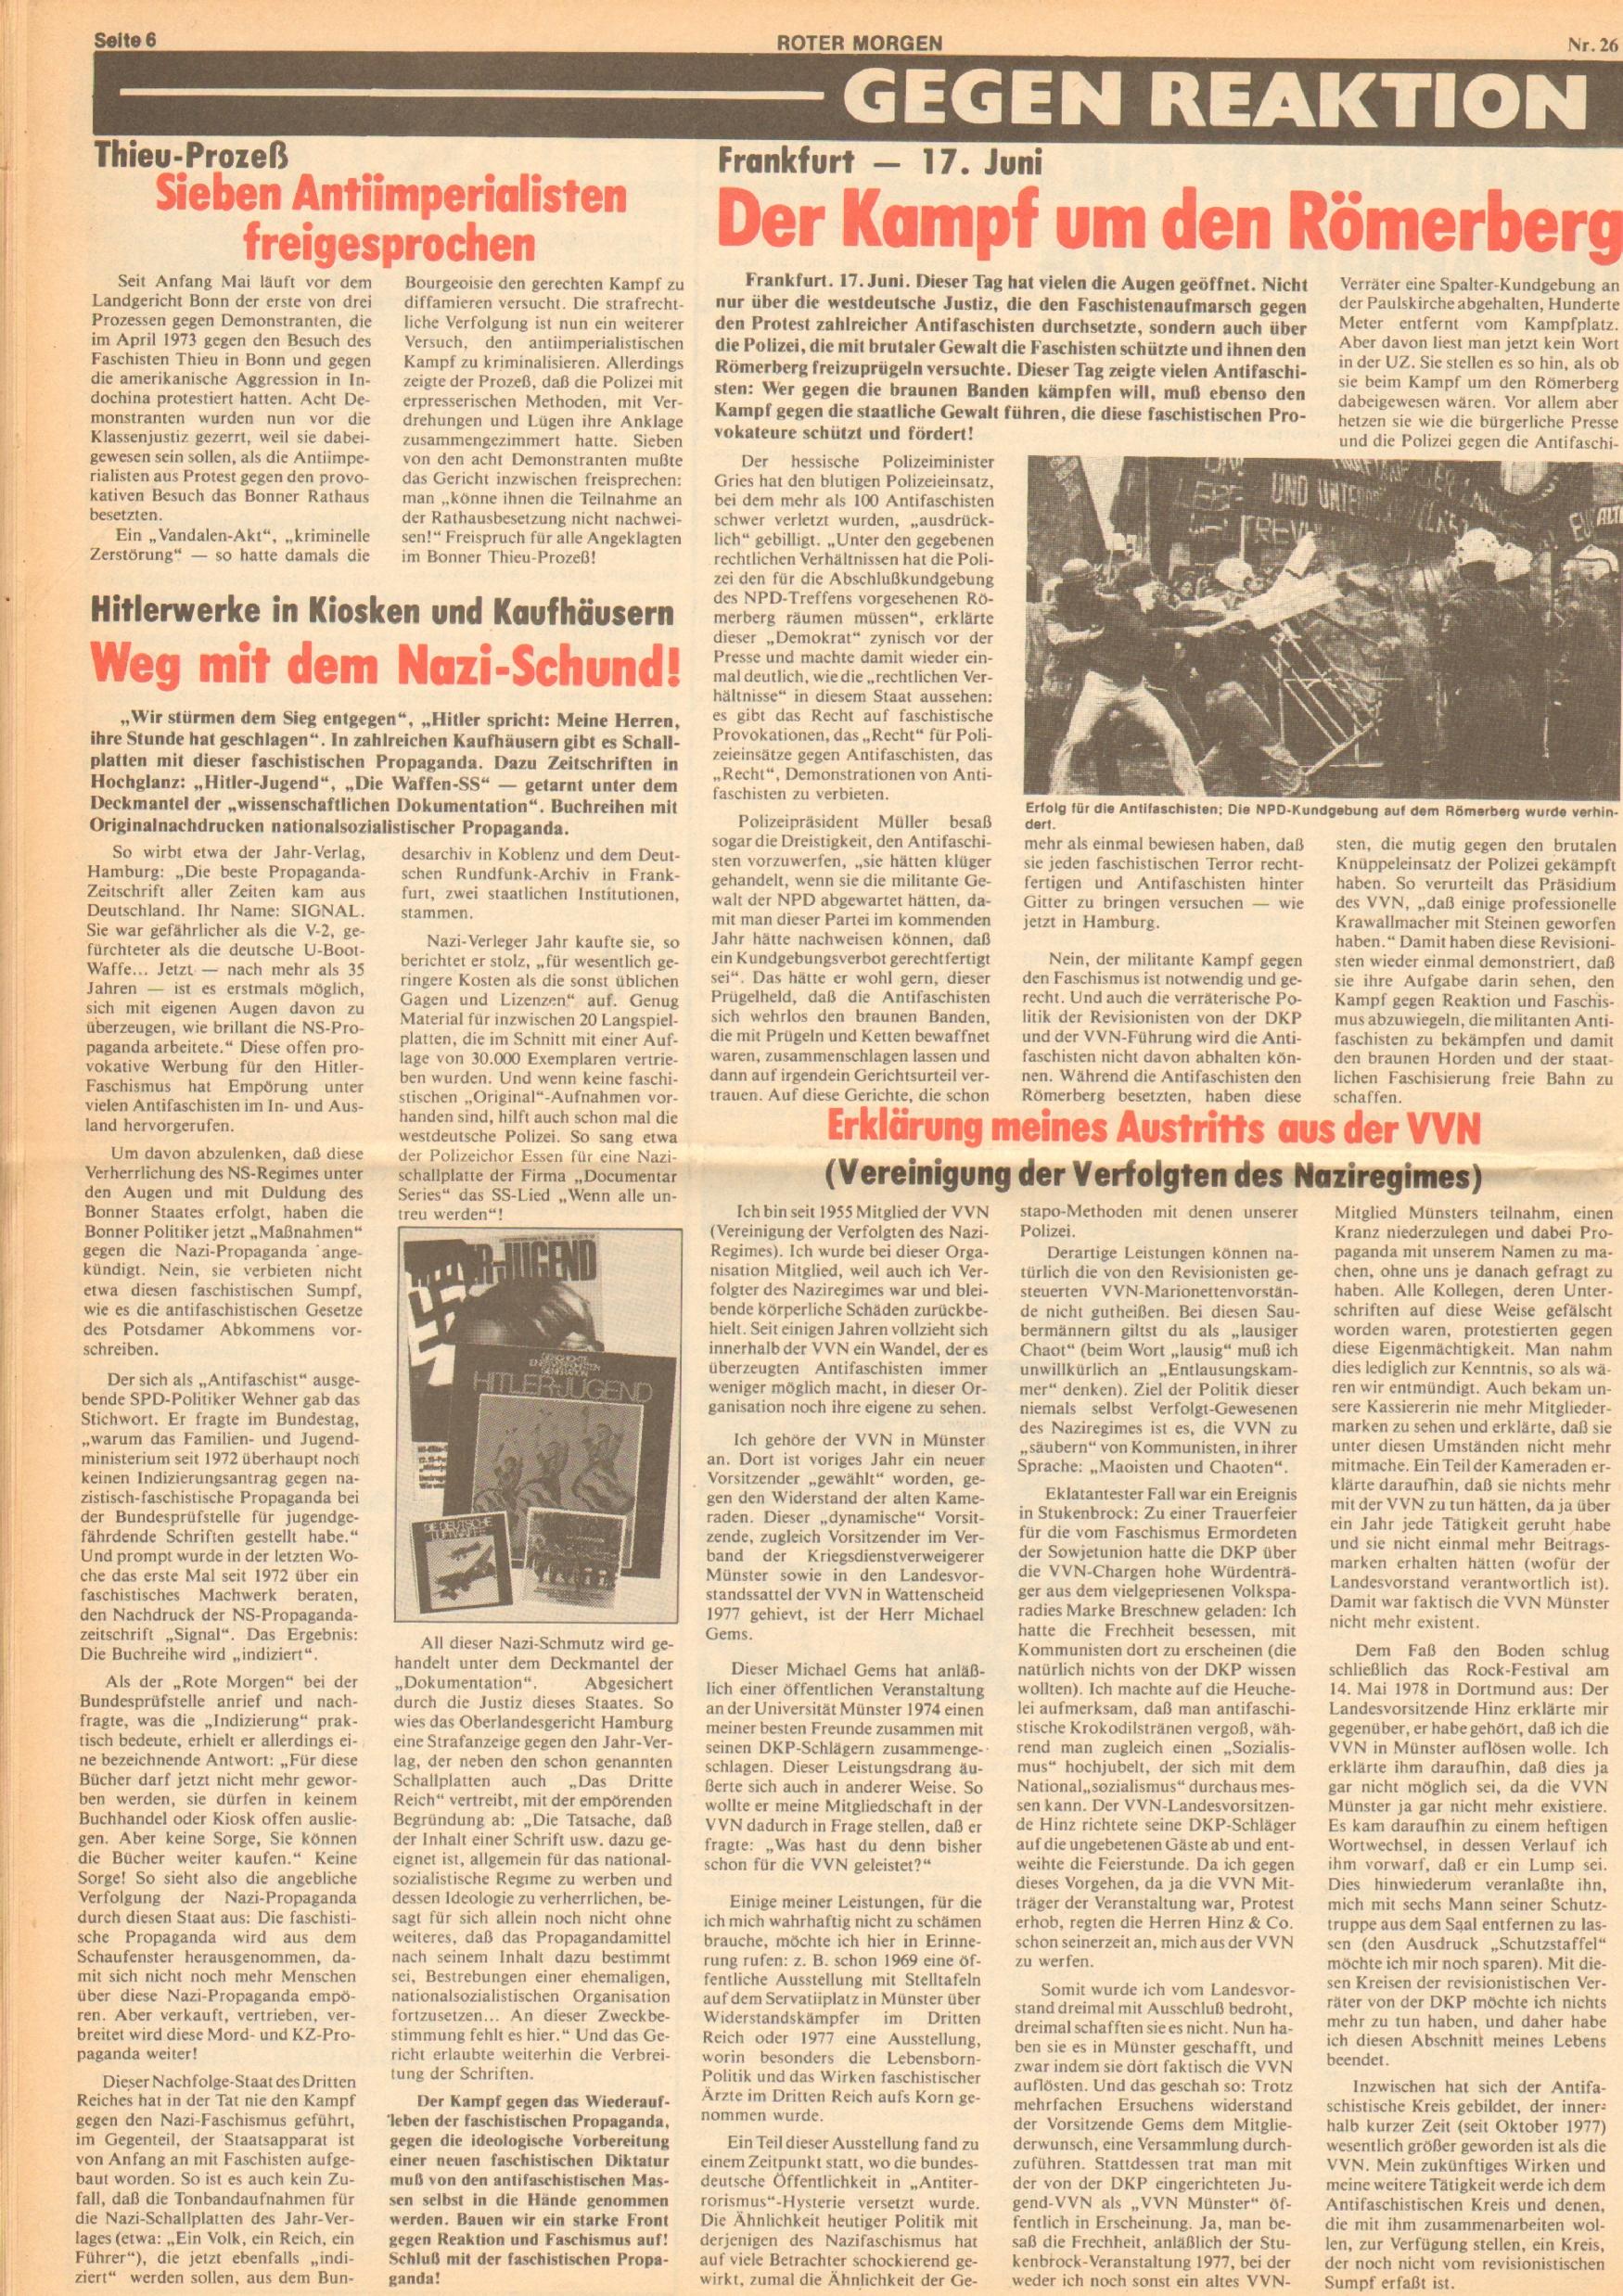 Roter Morgen, 12. Jg., 30. Juni 1978, Nr. 26, Seite 6